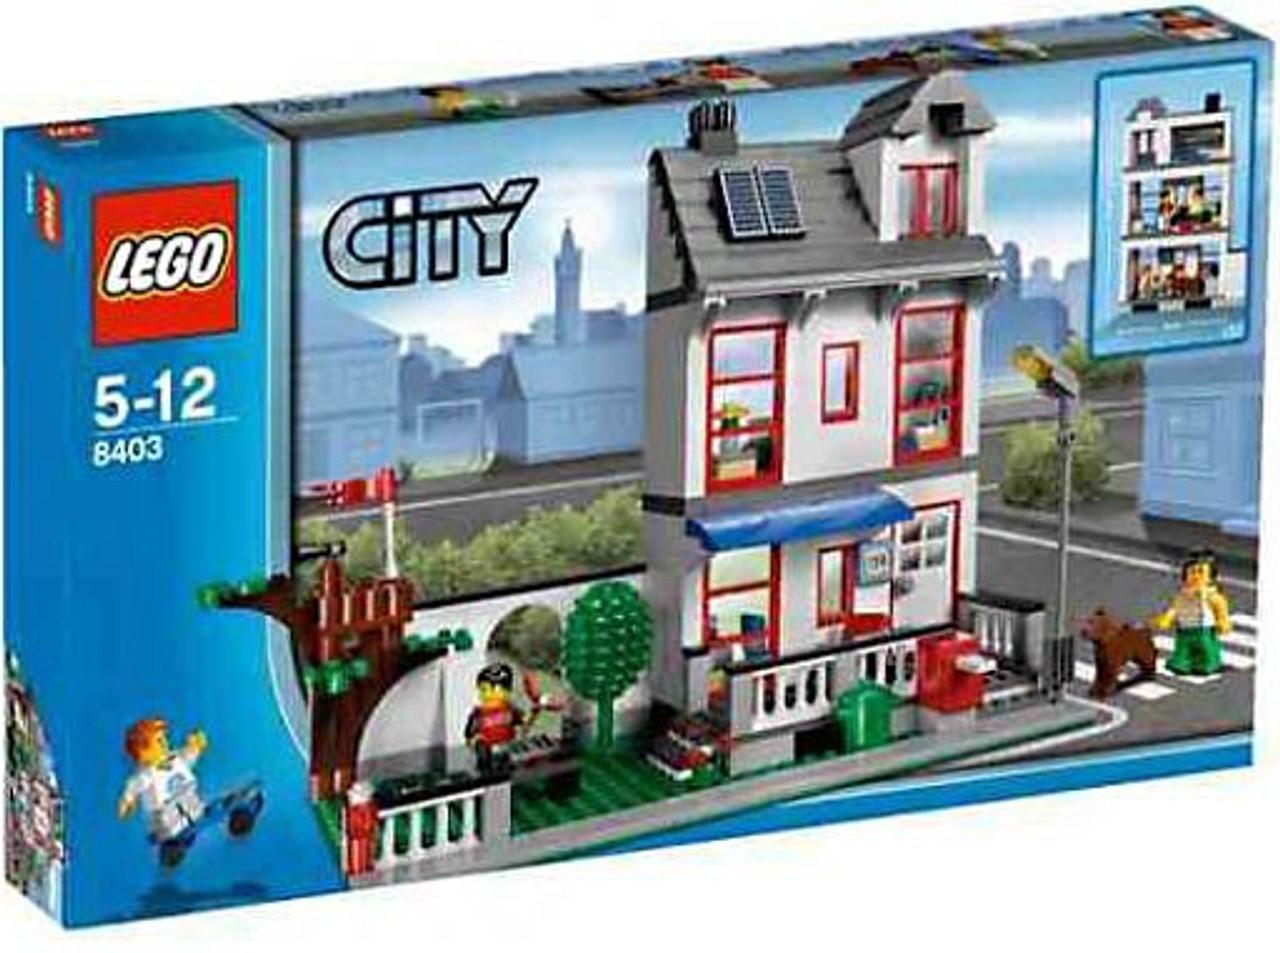 LEGO City House Exclusive Set #8403